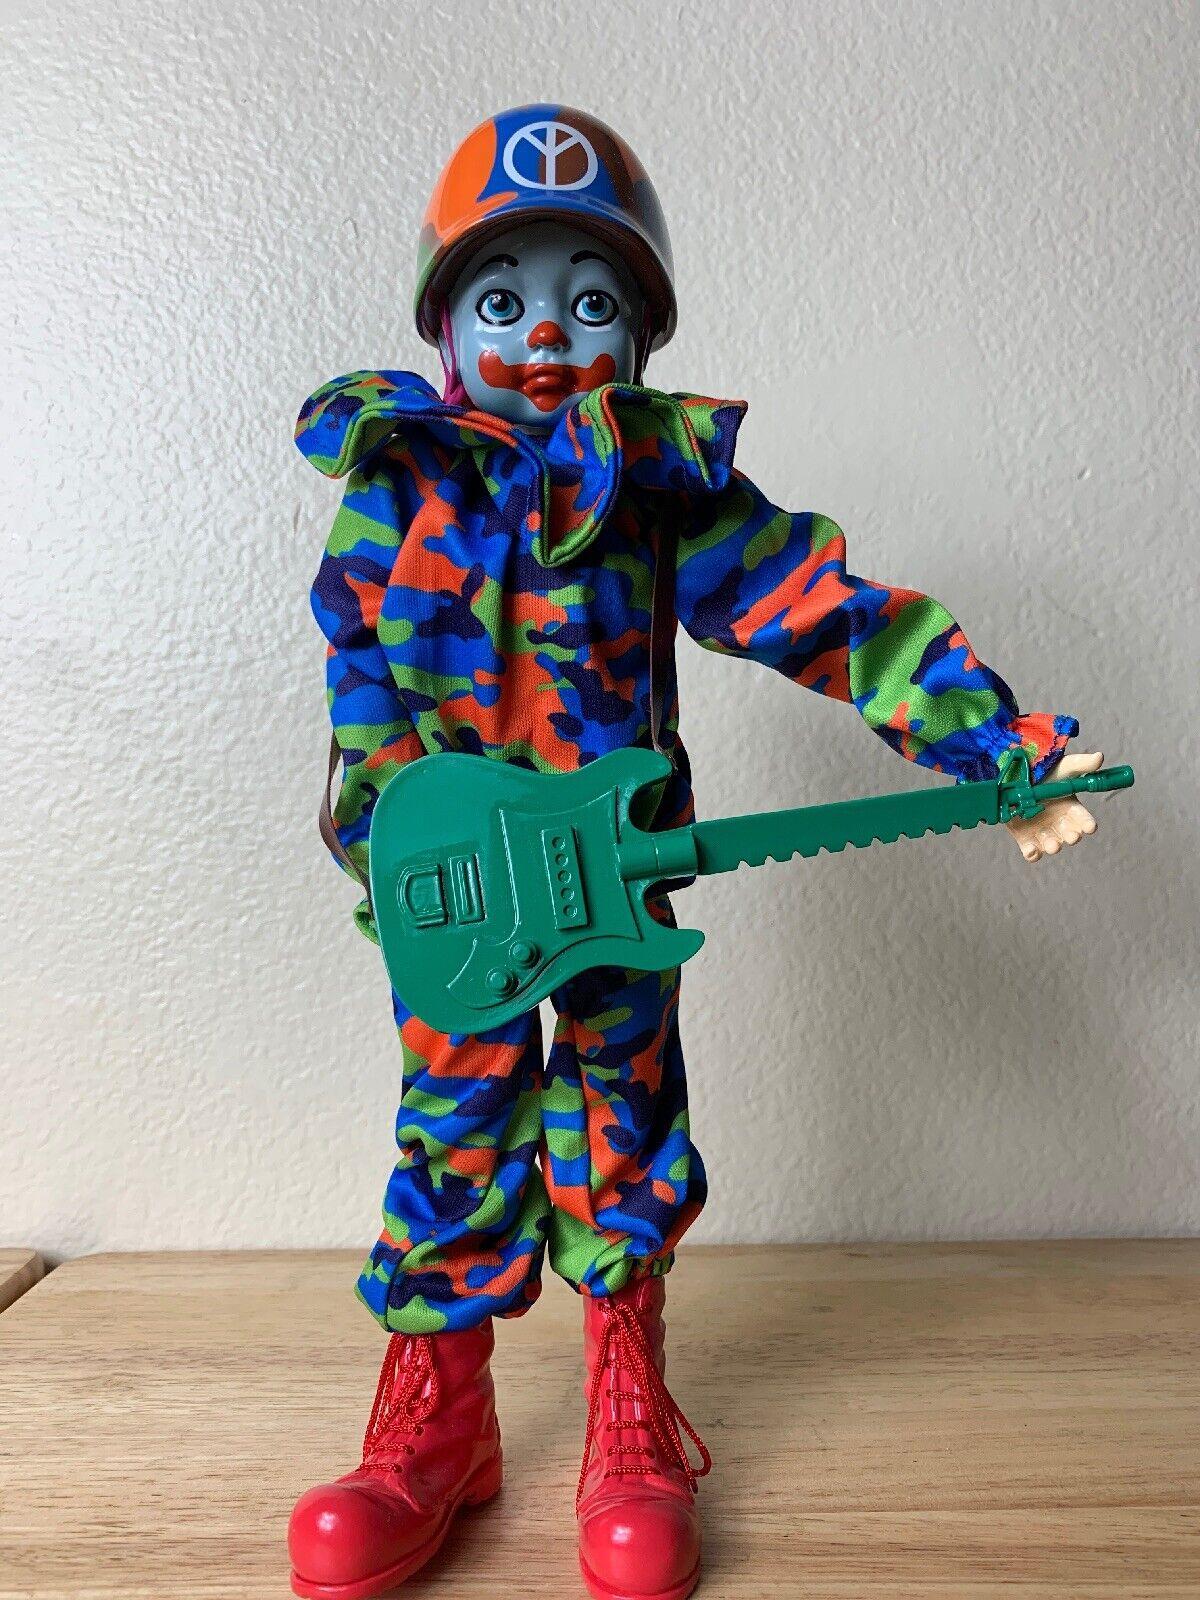 CAMO PEACE CLOWN COMBRAT 12 VINYL cifra RON inglese FROM POPAGeA X giocattoloQUBE